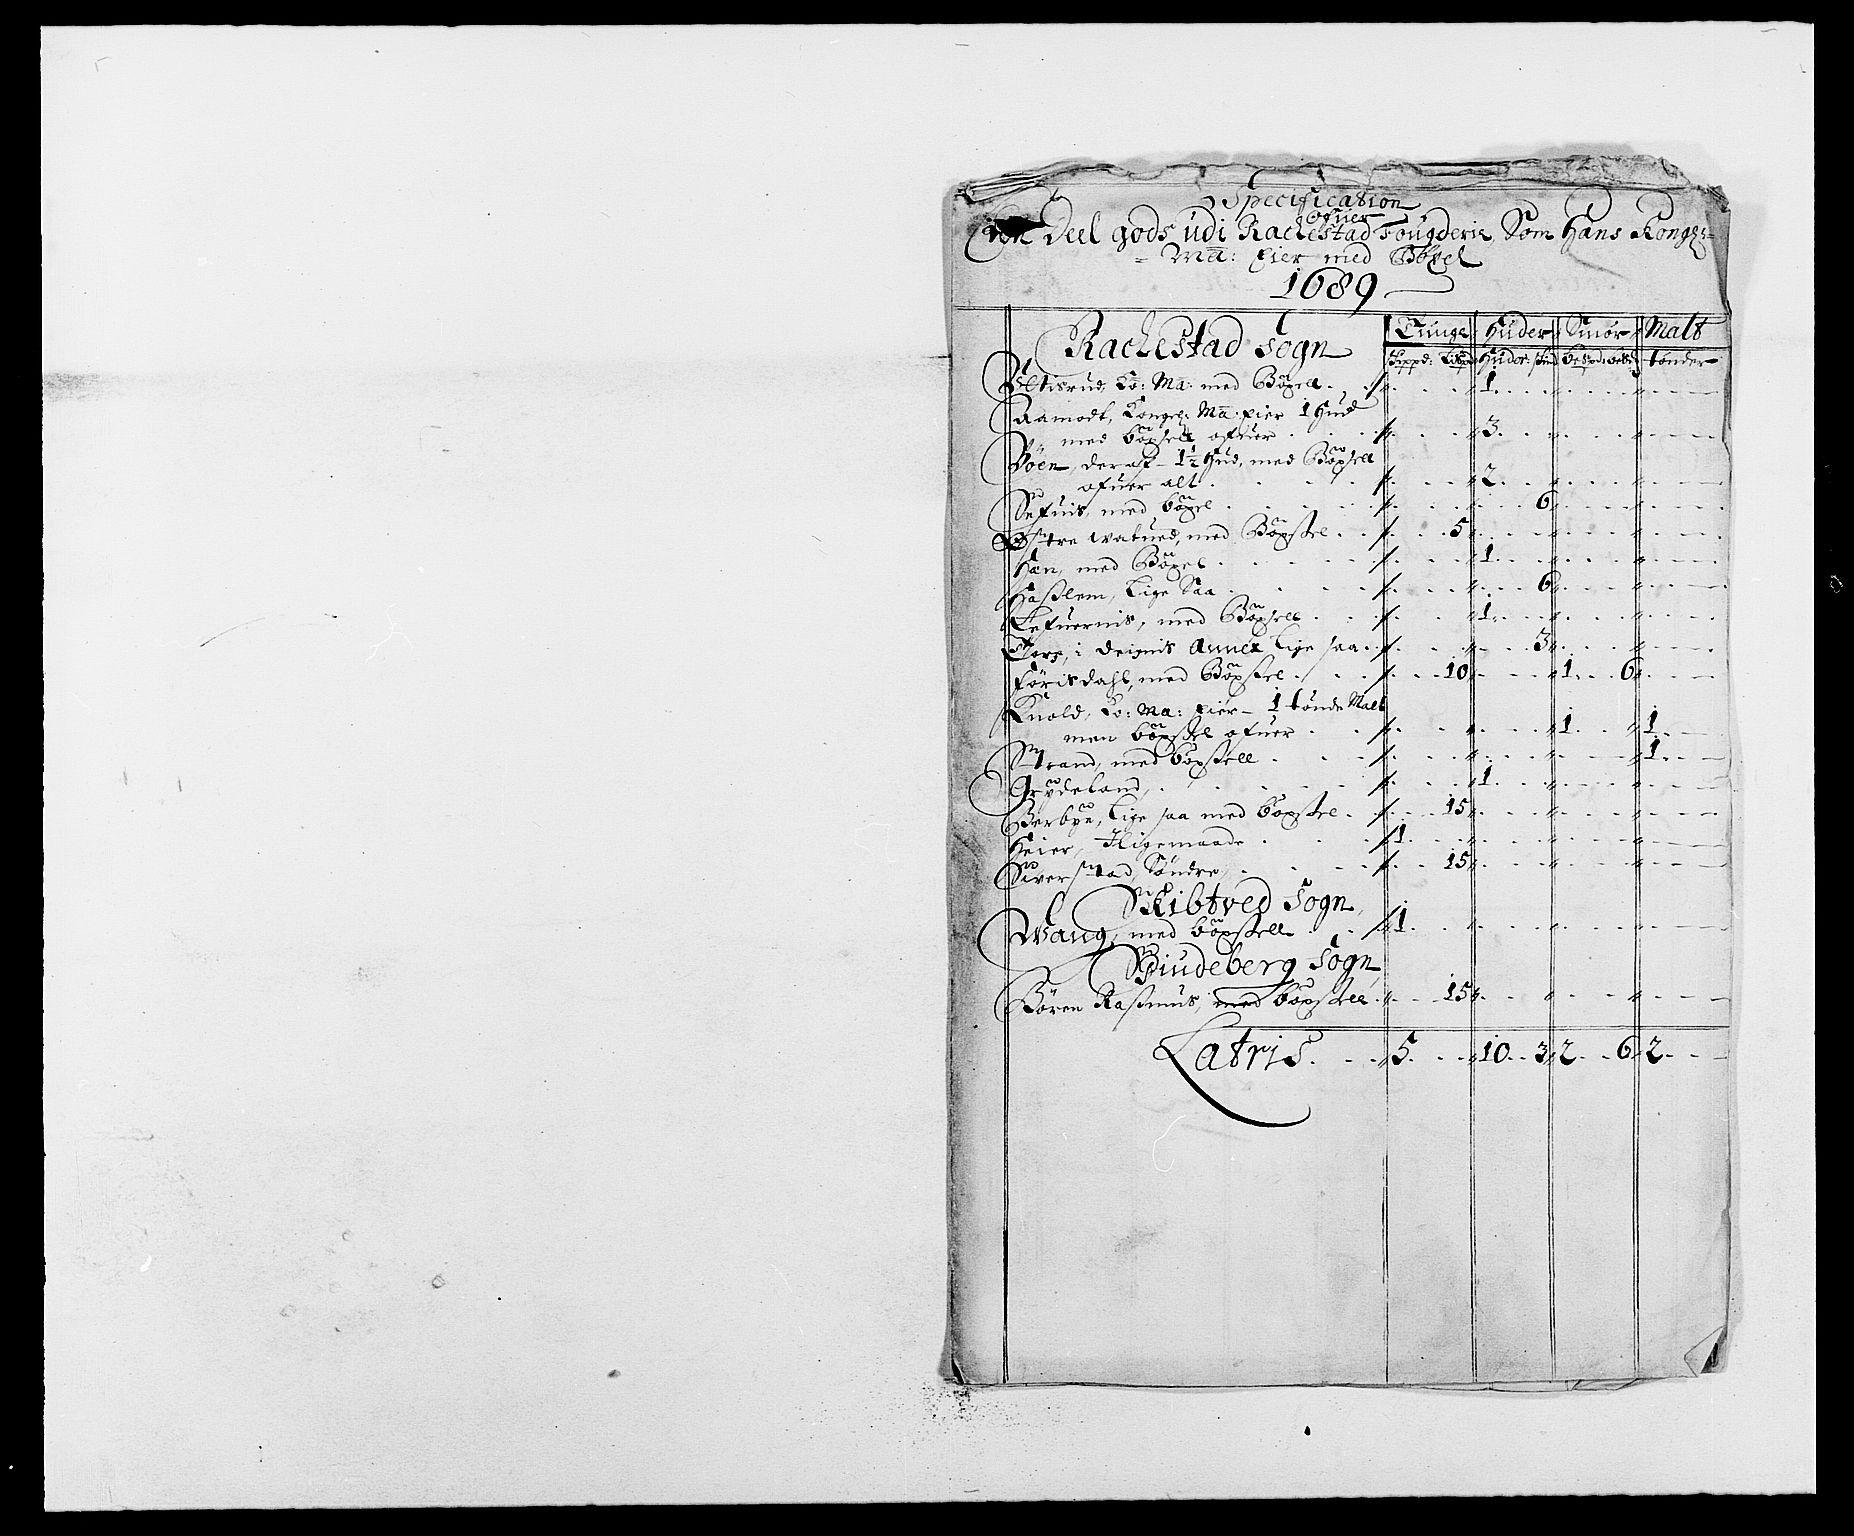 RA, Rentekammeret inntil 1814, Reviderte regnskaper, Fogderegnskap, R05/L0277: Fogderegnskap Rakkestad, 1689-1690, s. 38